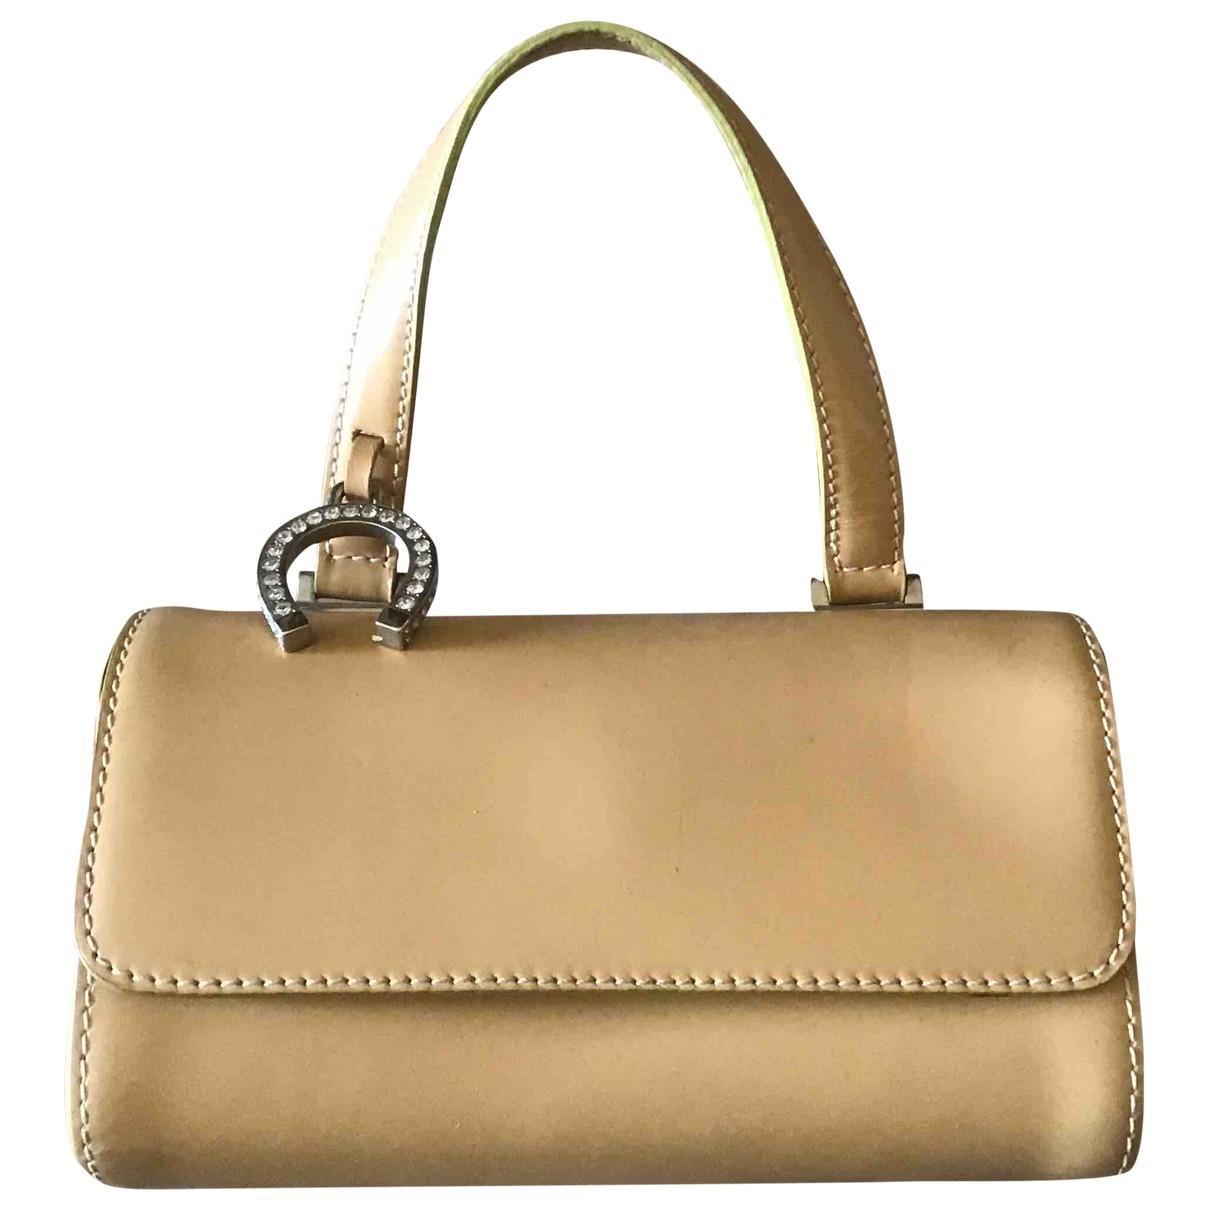 Moschino \N Handtasche in  Kamel Leder